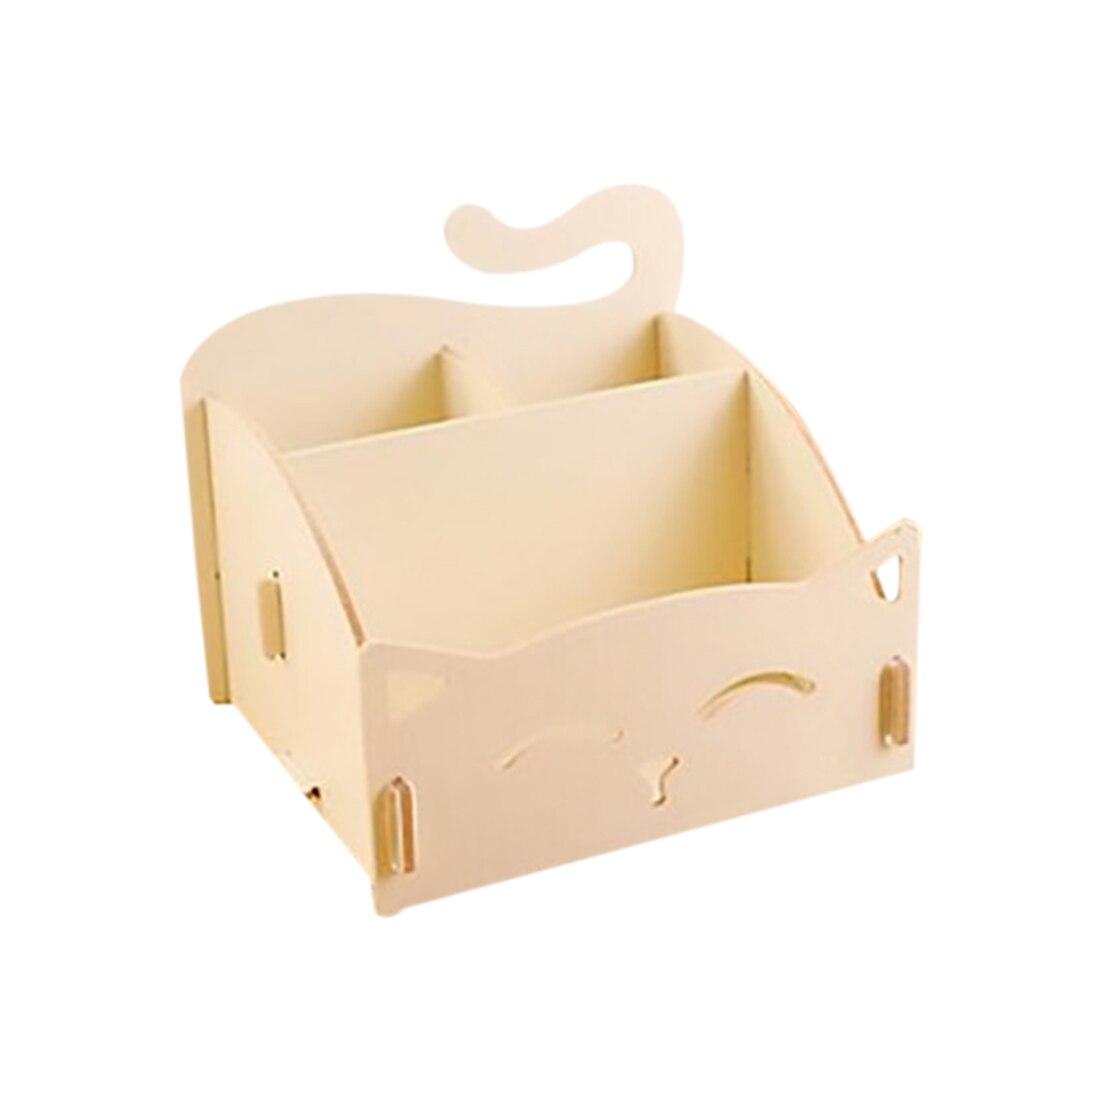 Wooden Box Cute Cat Pen Box Desktop Storage Assembly DIY Wood Makeup Organizer Cosmetics Storage Box 15.4*13*13.5cm (Beige)